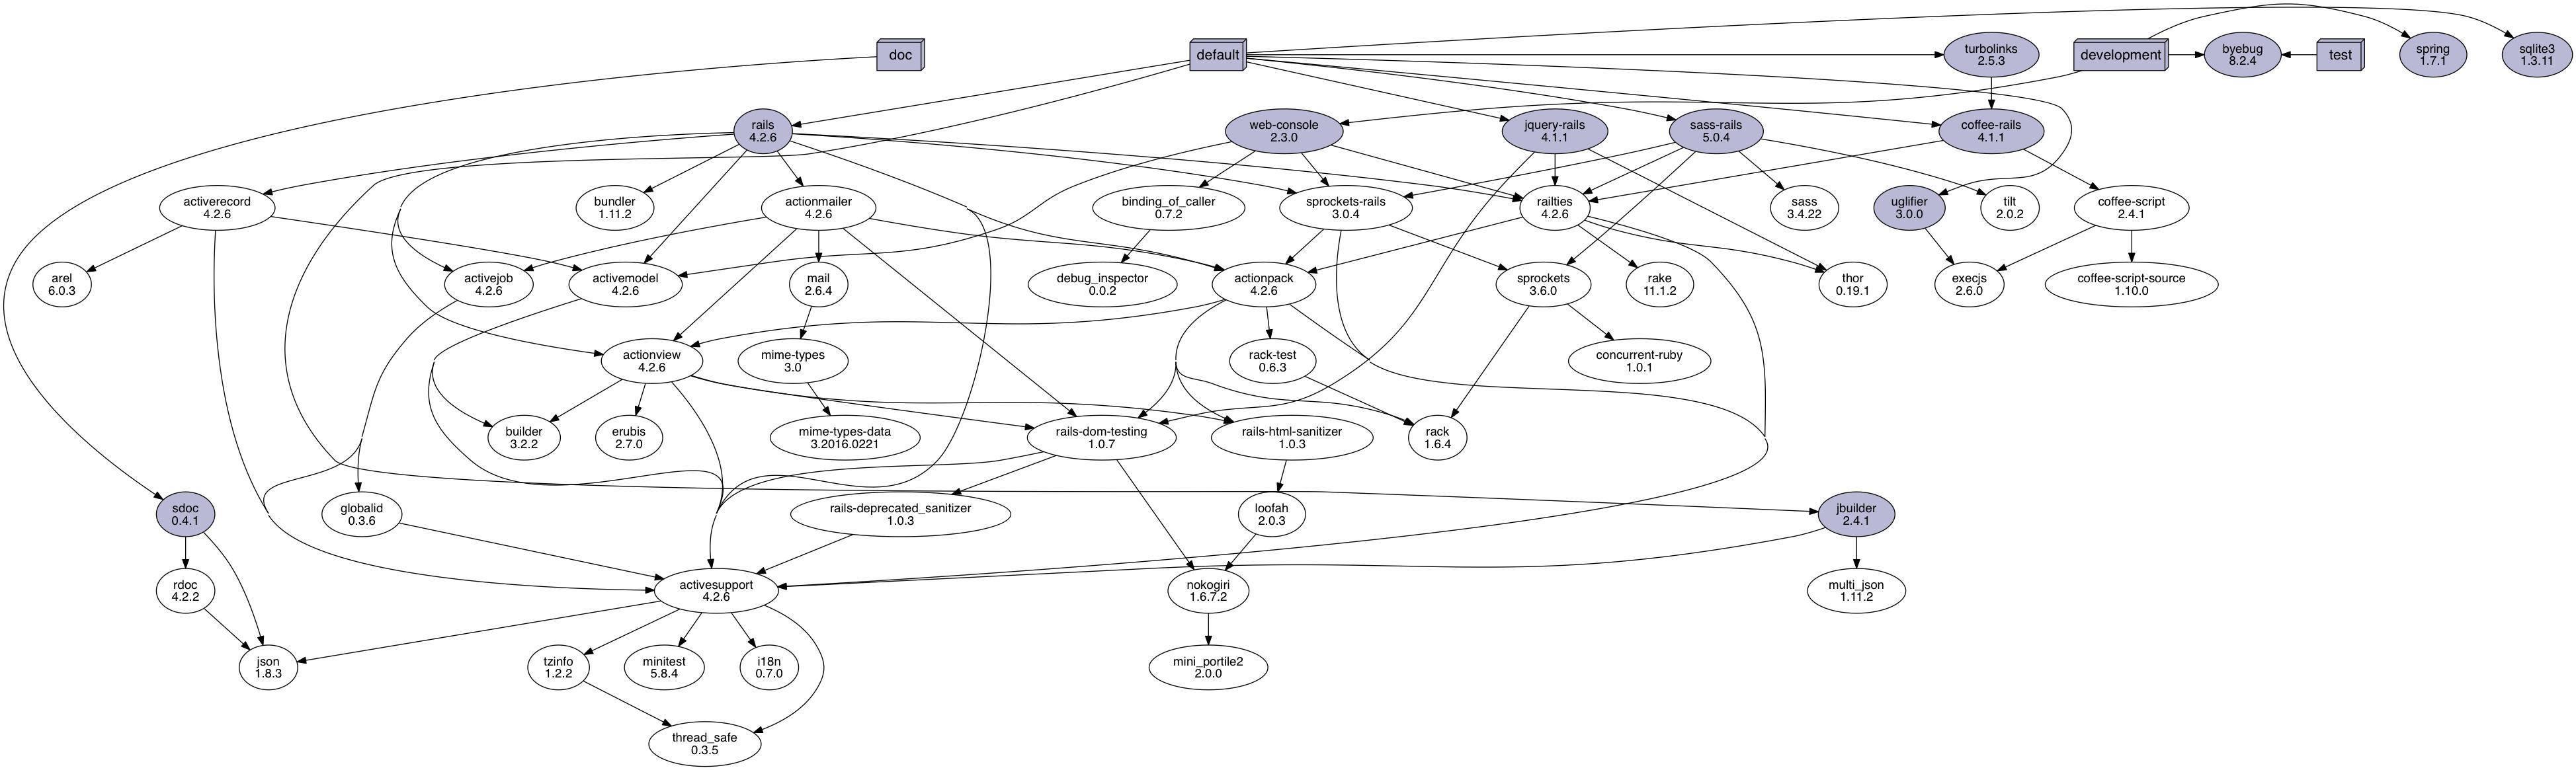 gem_graph.png